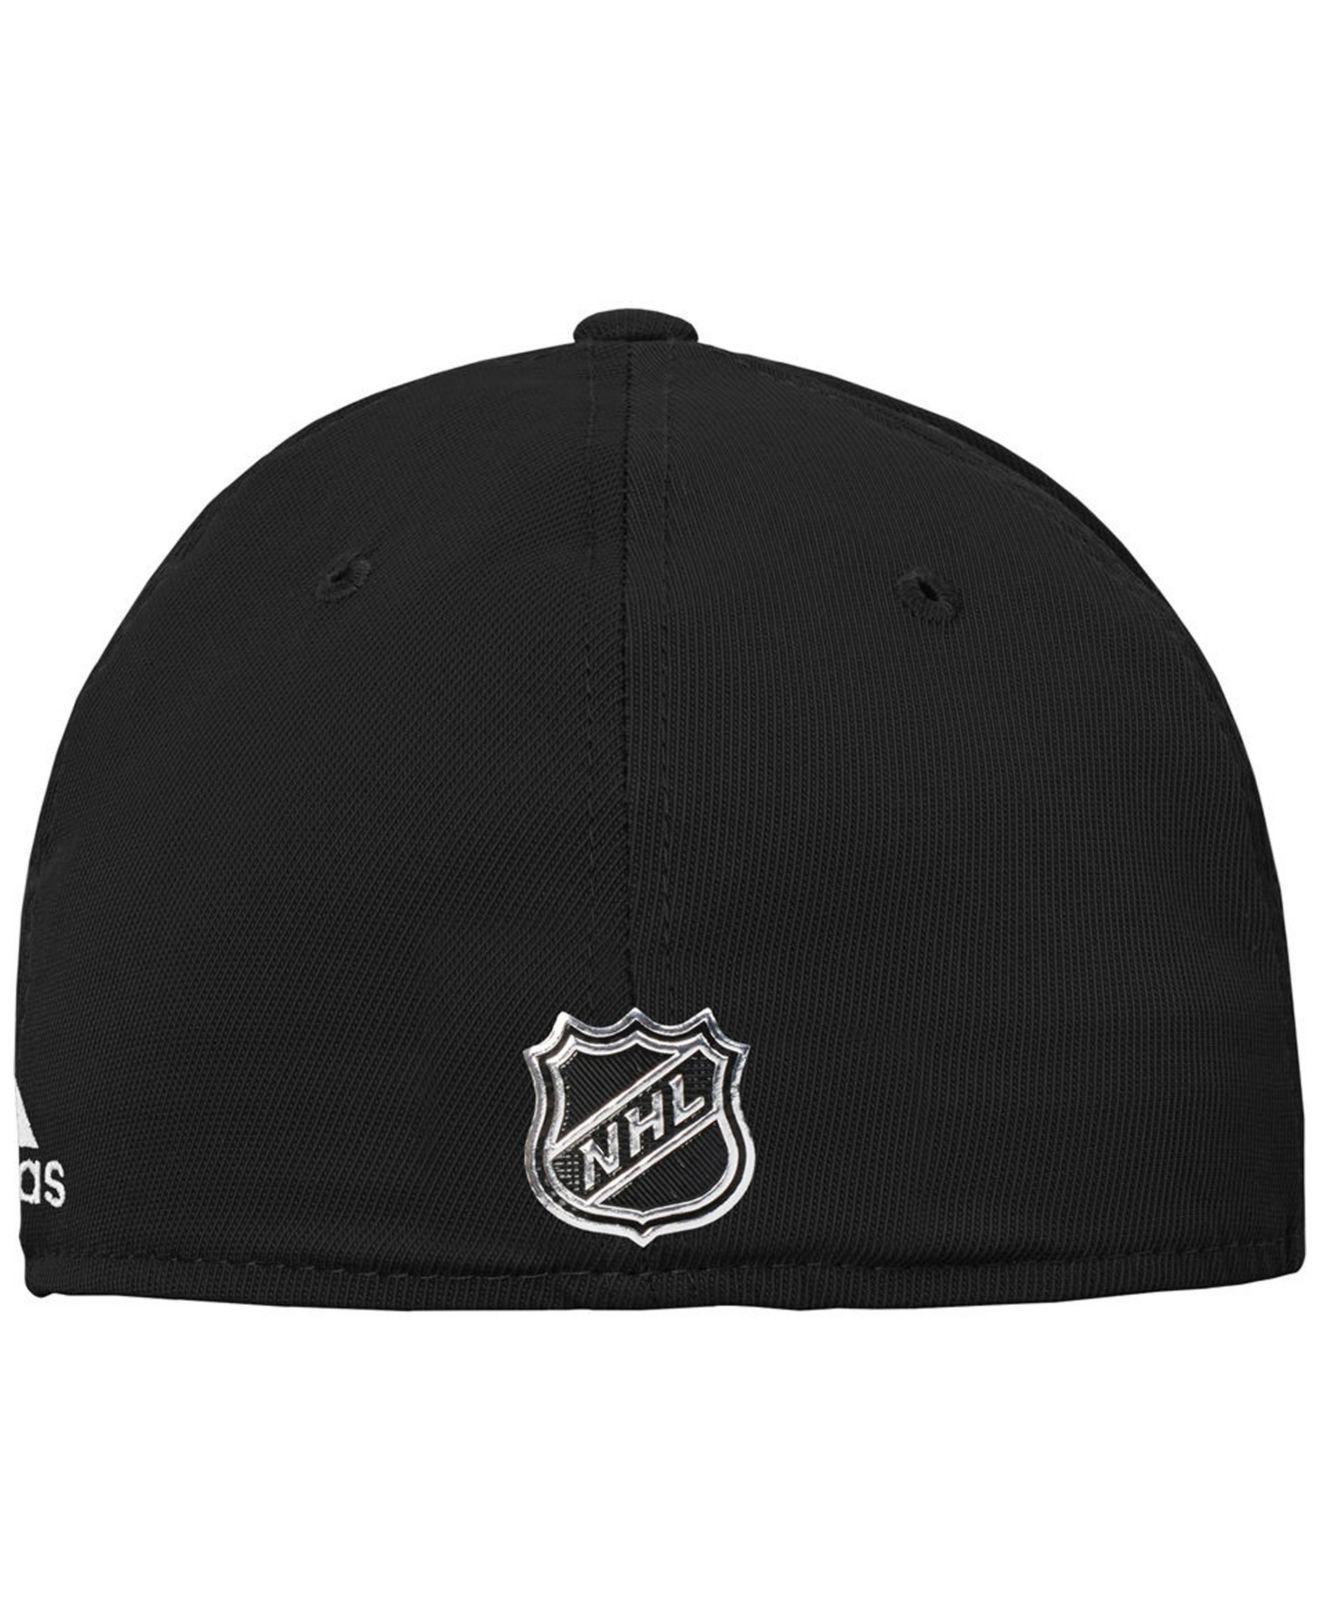 newest 70bc2 7392c ... usa lyst adidas pittsburgh penguins 2nd season flex cap in black for men  d131f 8f9bd